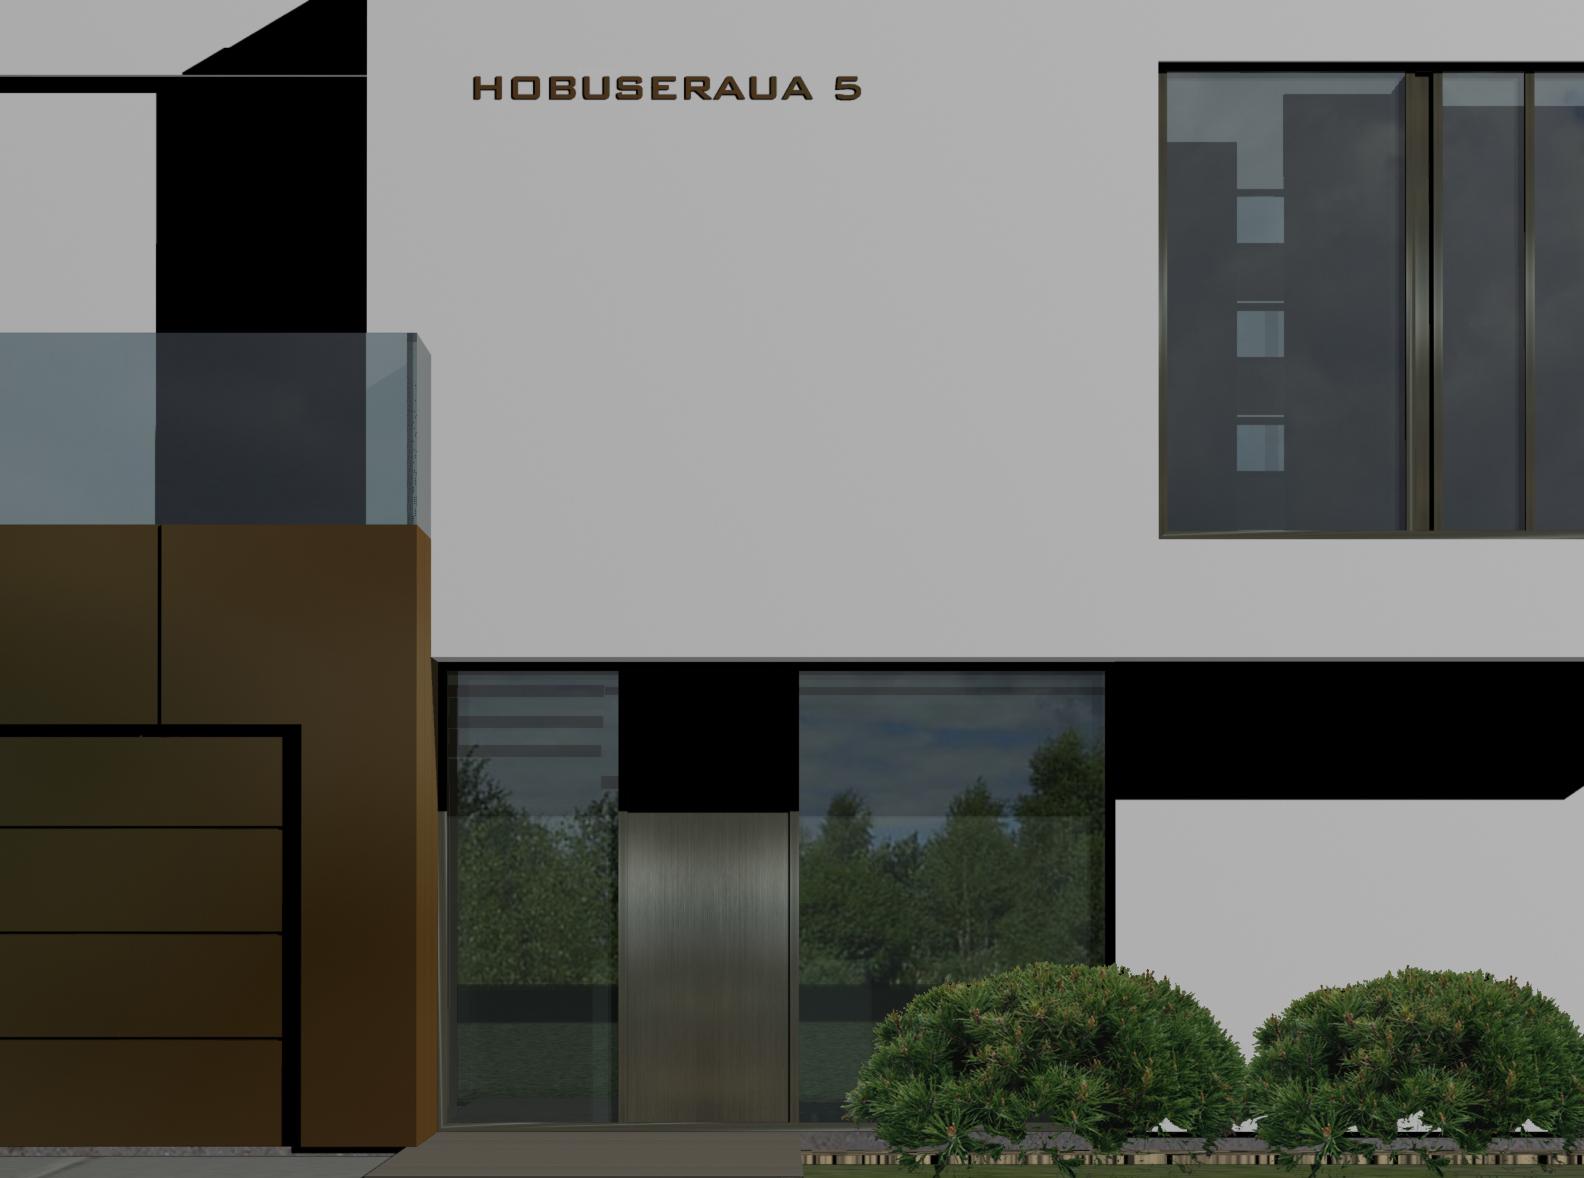 ERAMU - HOBURAUA 5, HAABERSTI, TALLINN, HARJUMAA